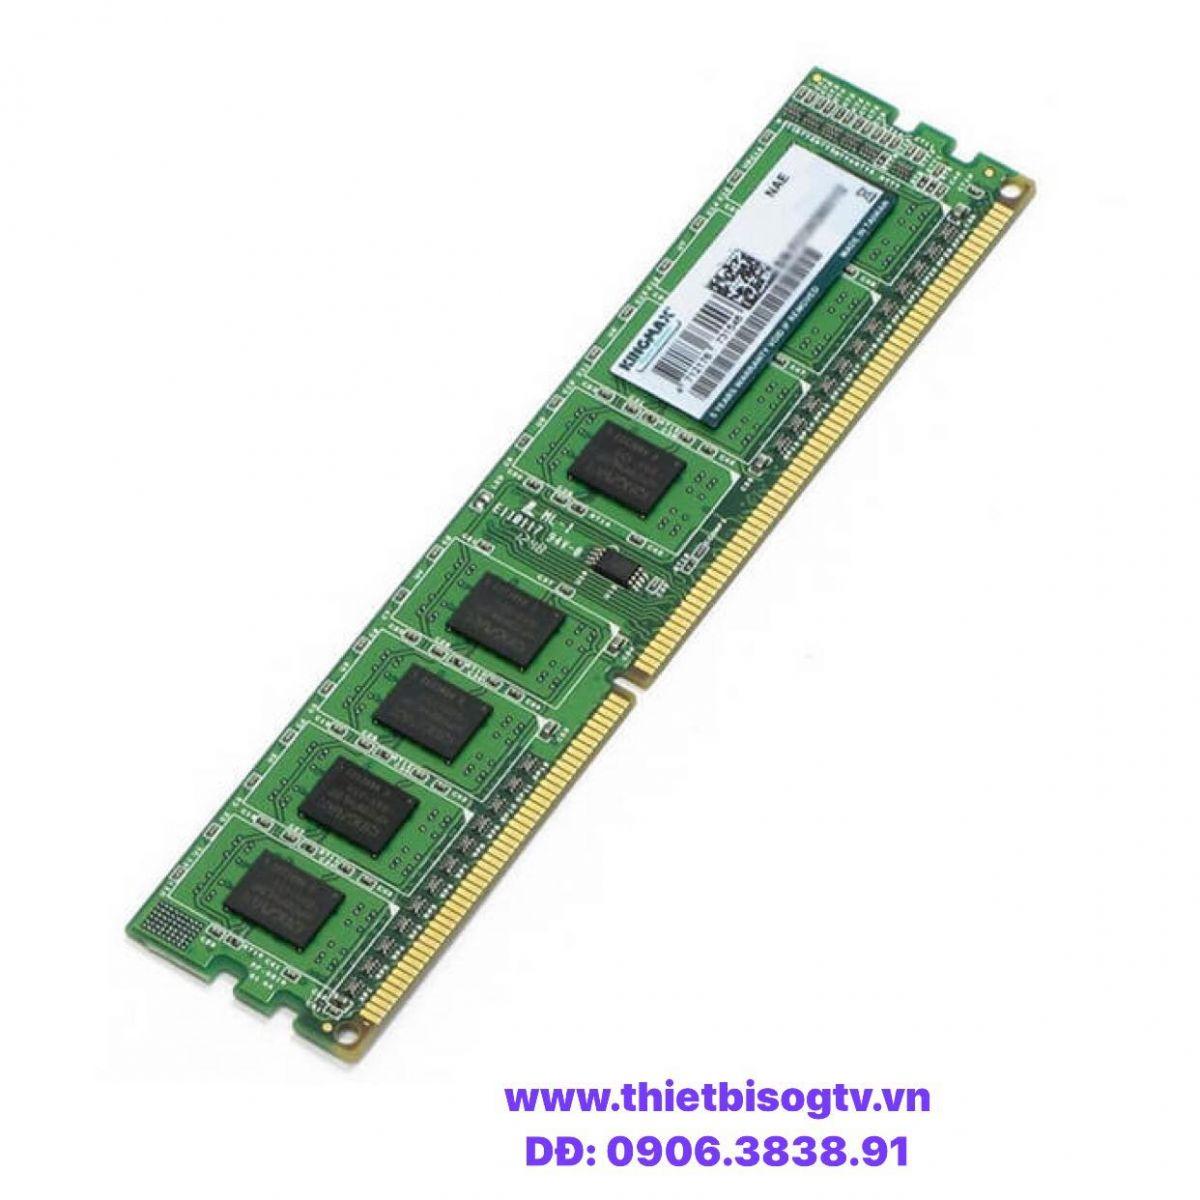 Bộ nhớ DDR4 Kingmax 48GB bus 2400